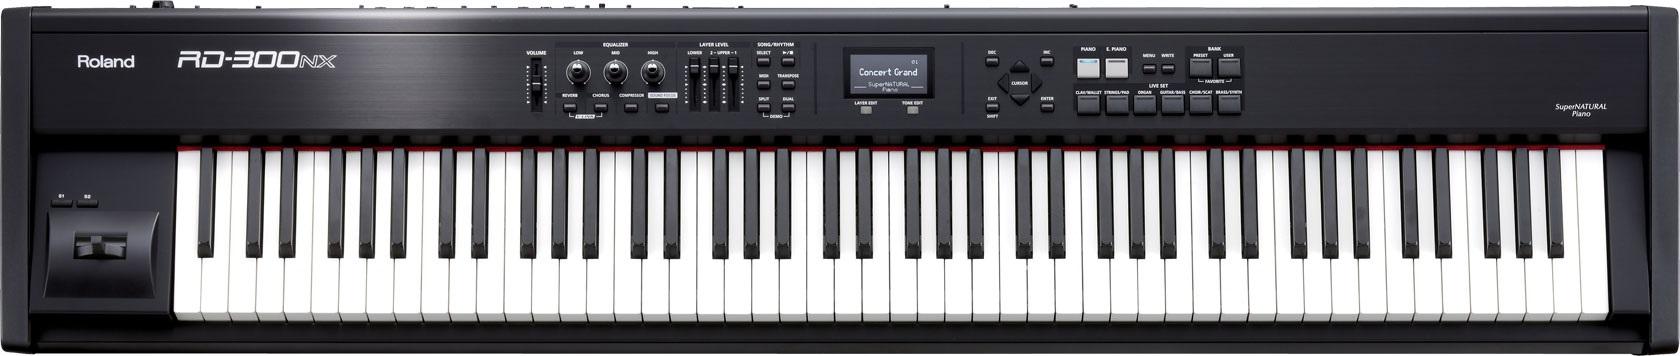 Roland RD-300 NX